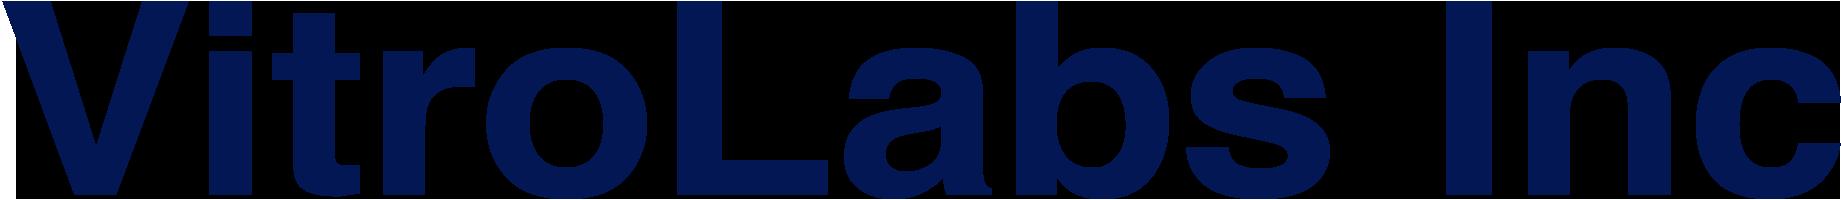 VitroLabs logo